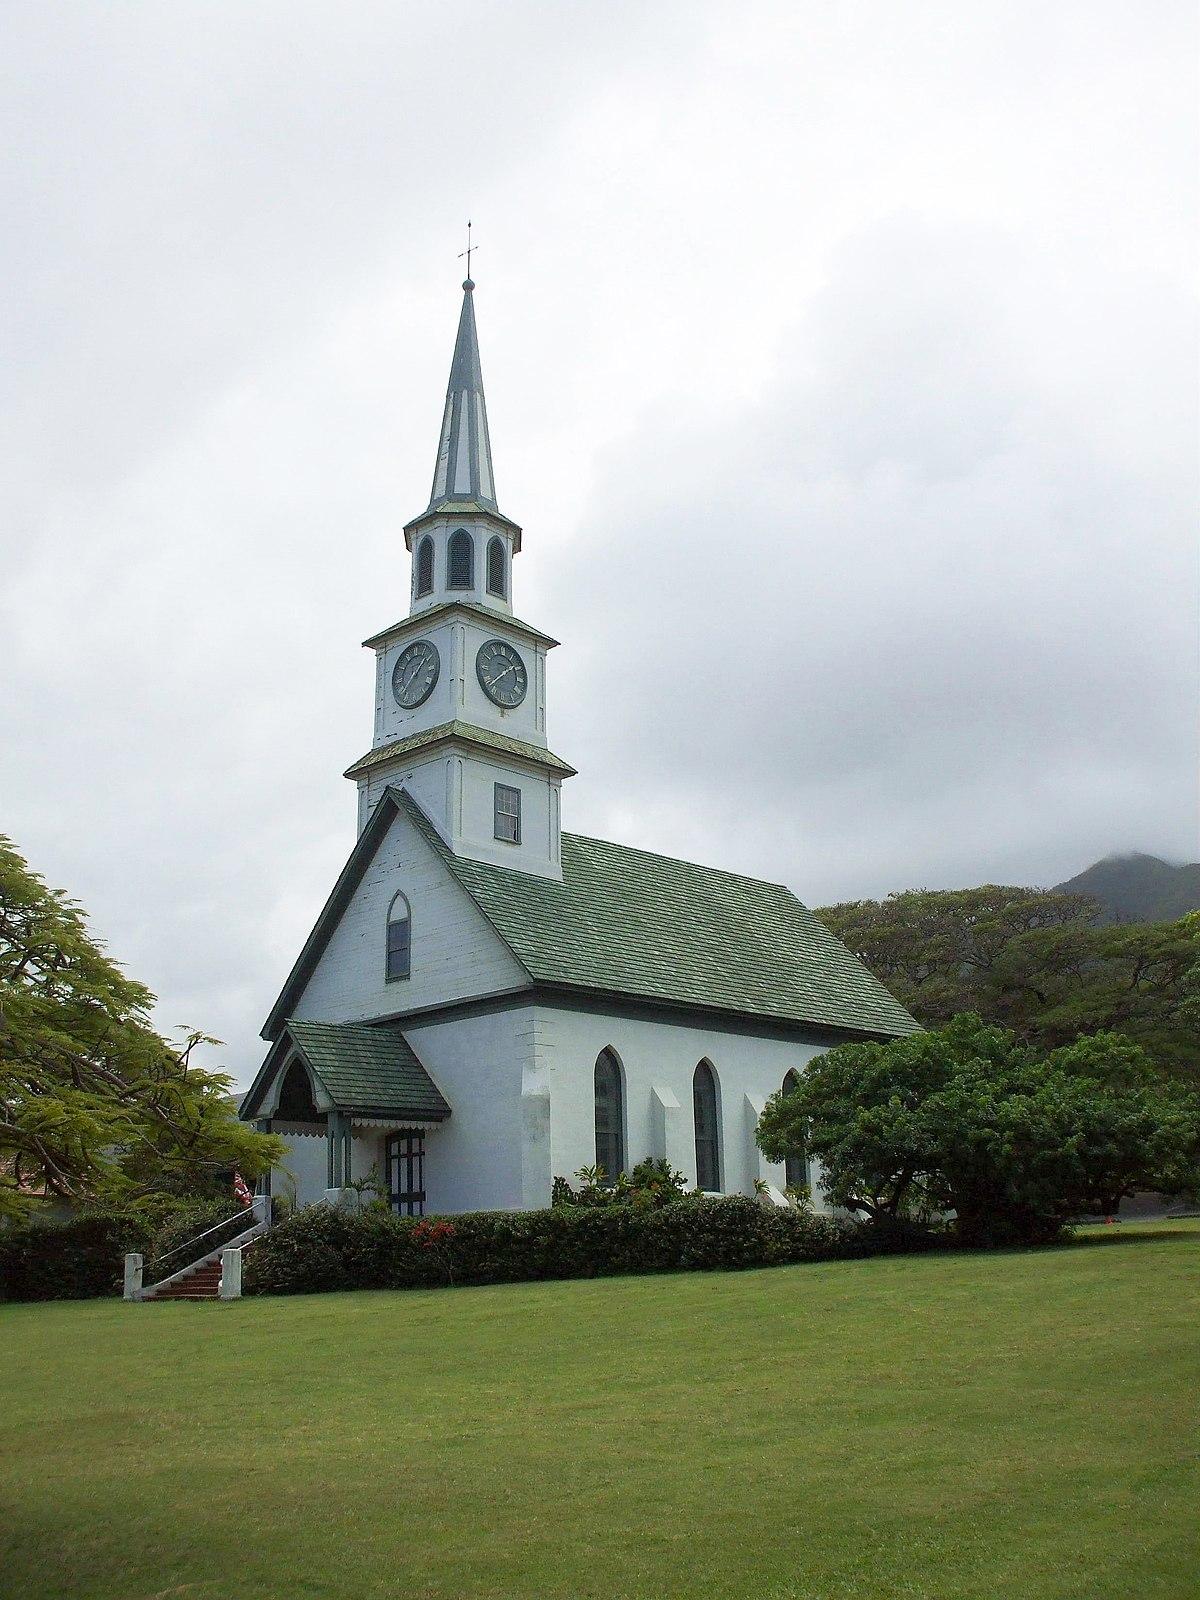 church kaahumanu wailuku maui ka ahumanu concert march elevation hawaiian historic wikipedia hawaii